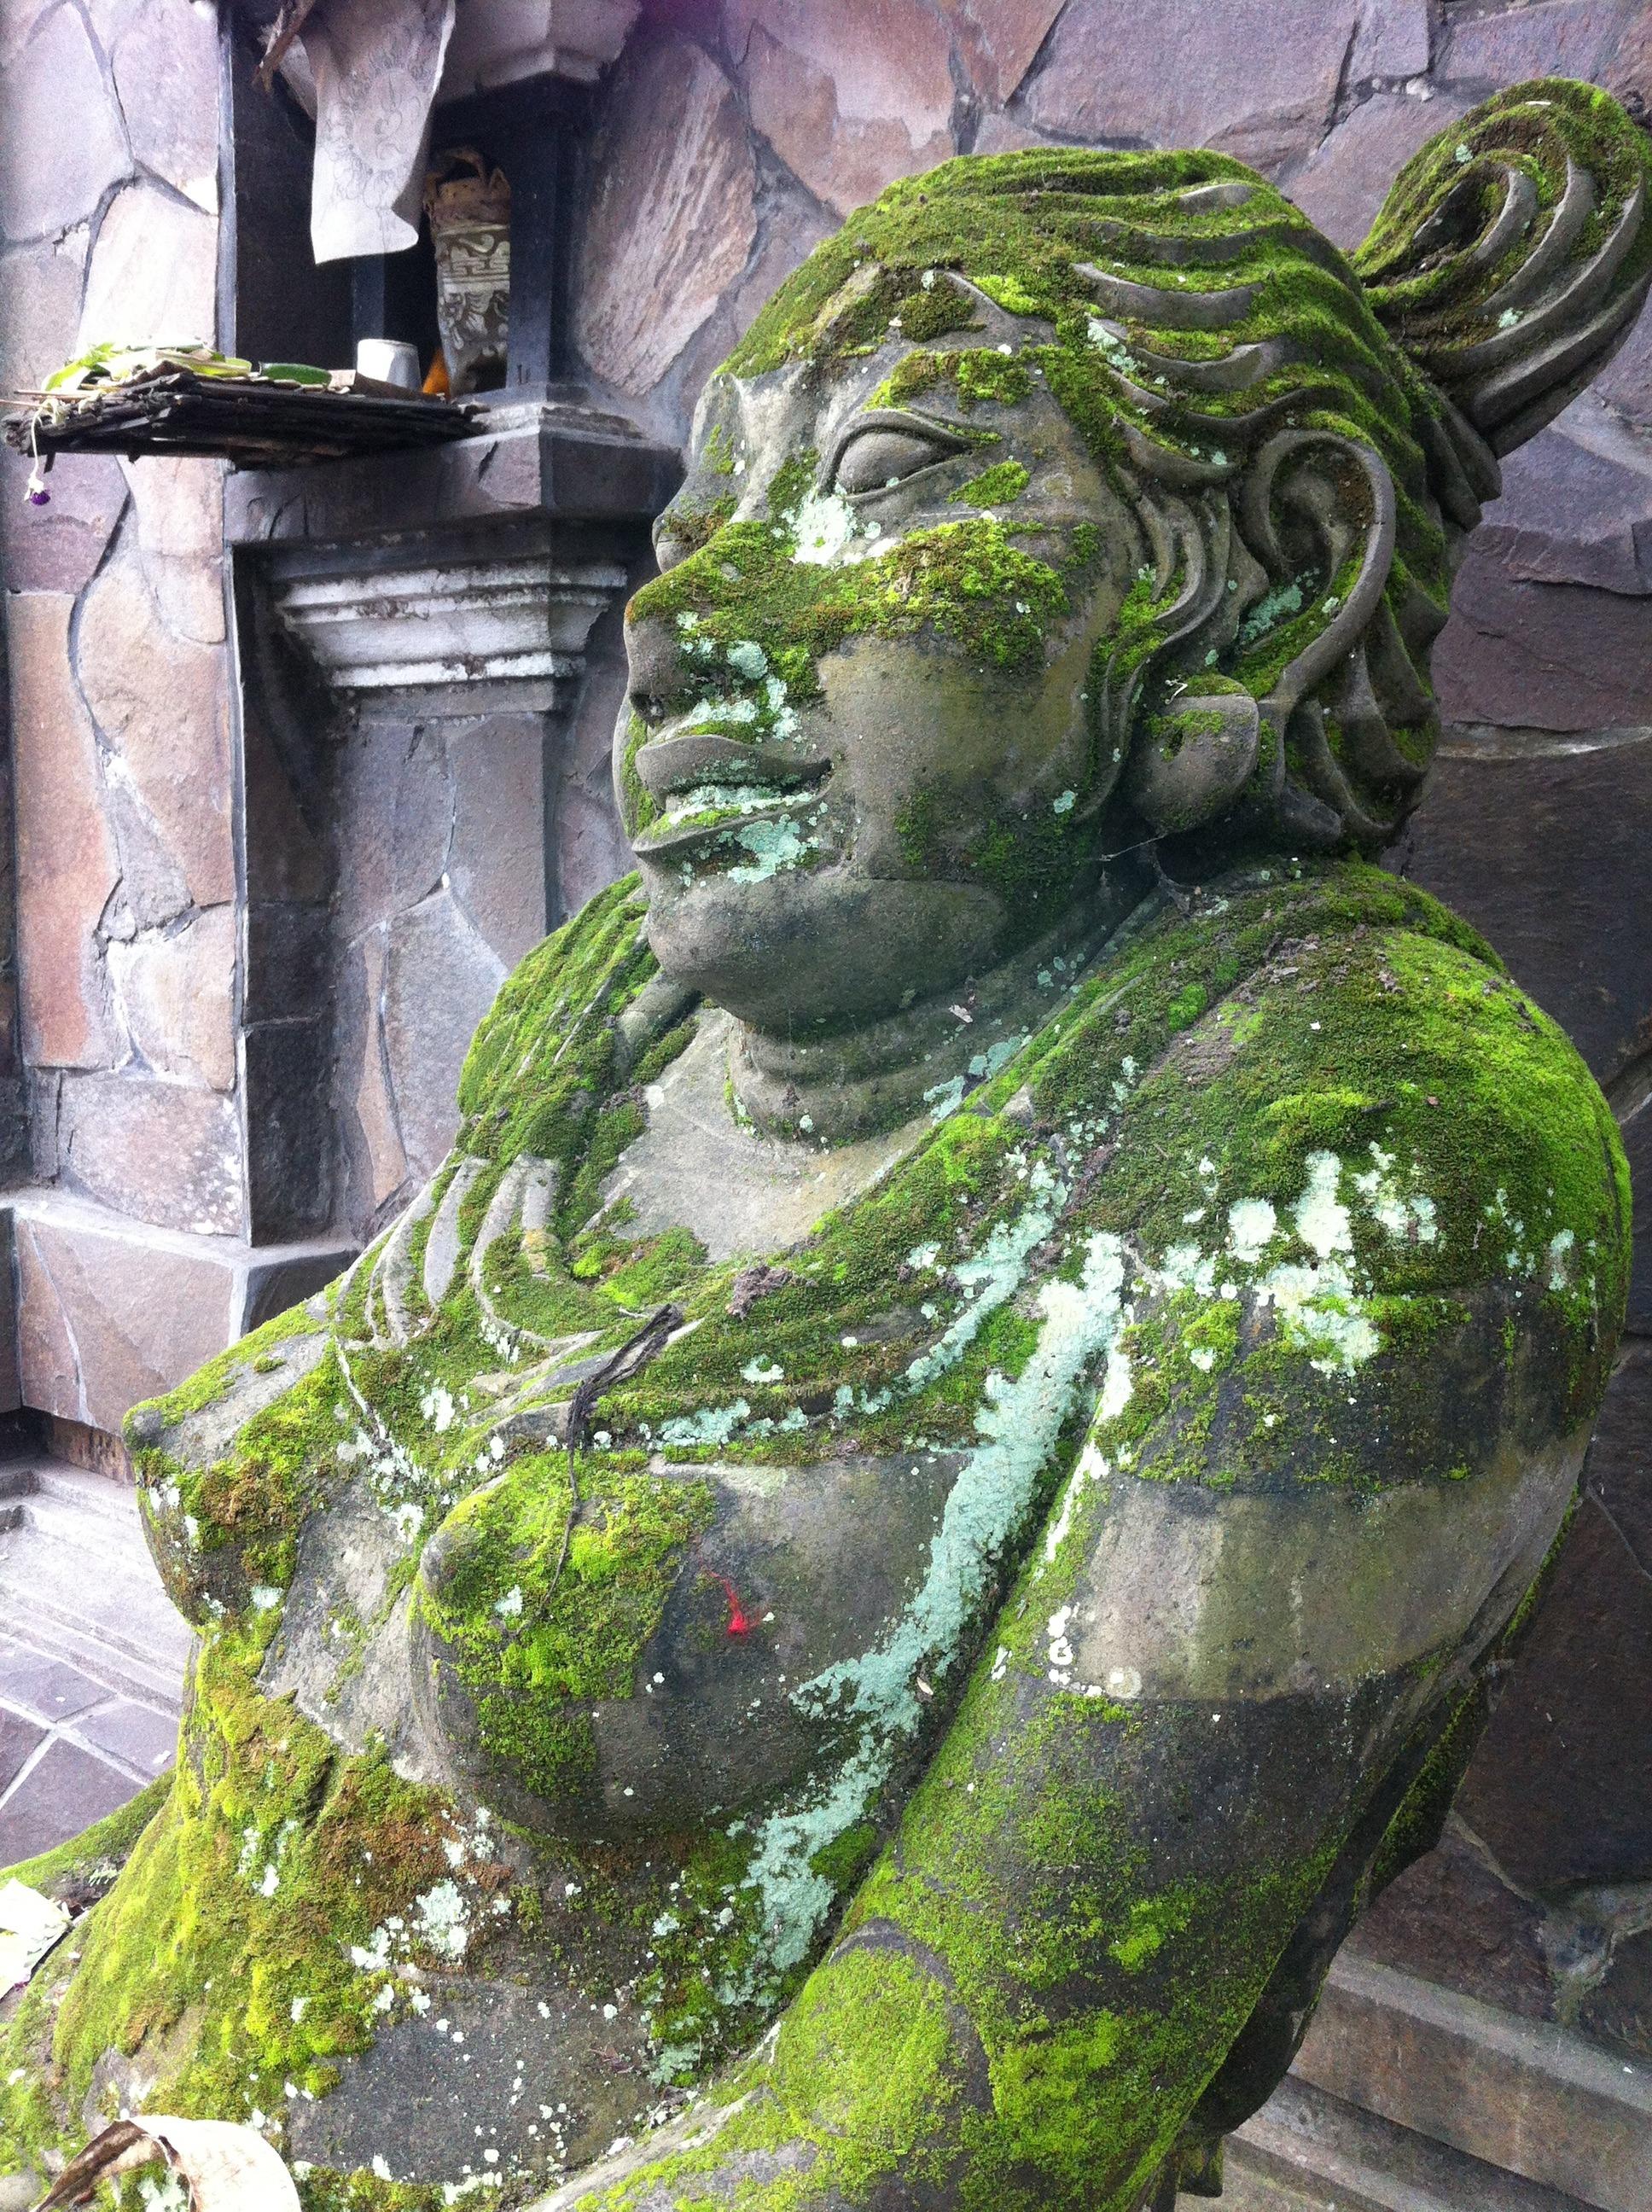 rock piedra monumento estatua verde jardn escultura art templo fuente tallado fuente de agua bali figura